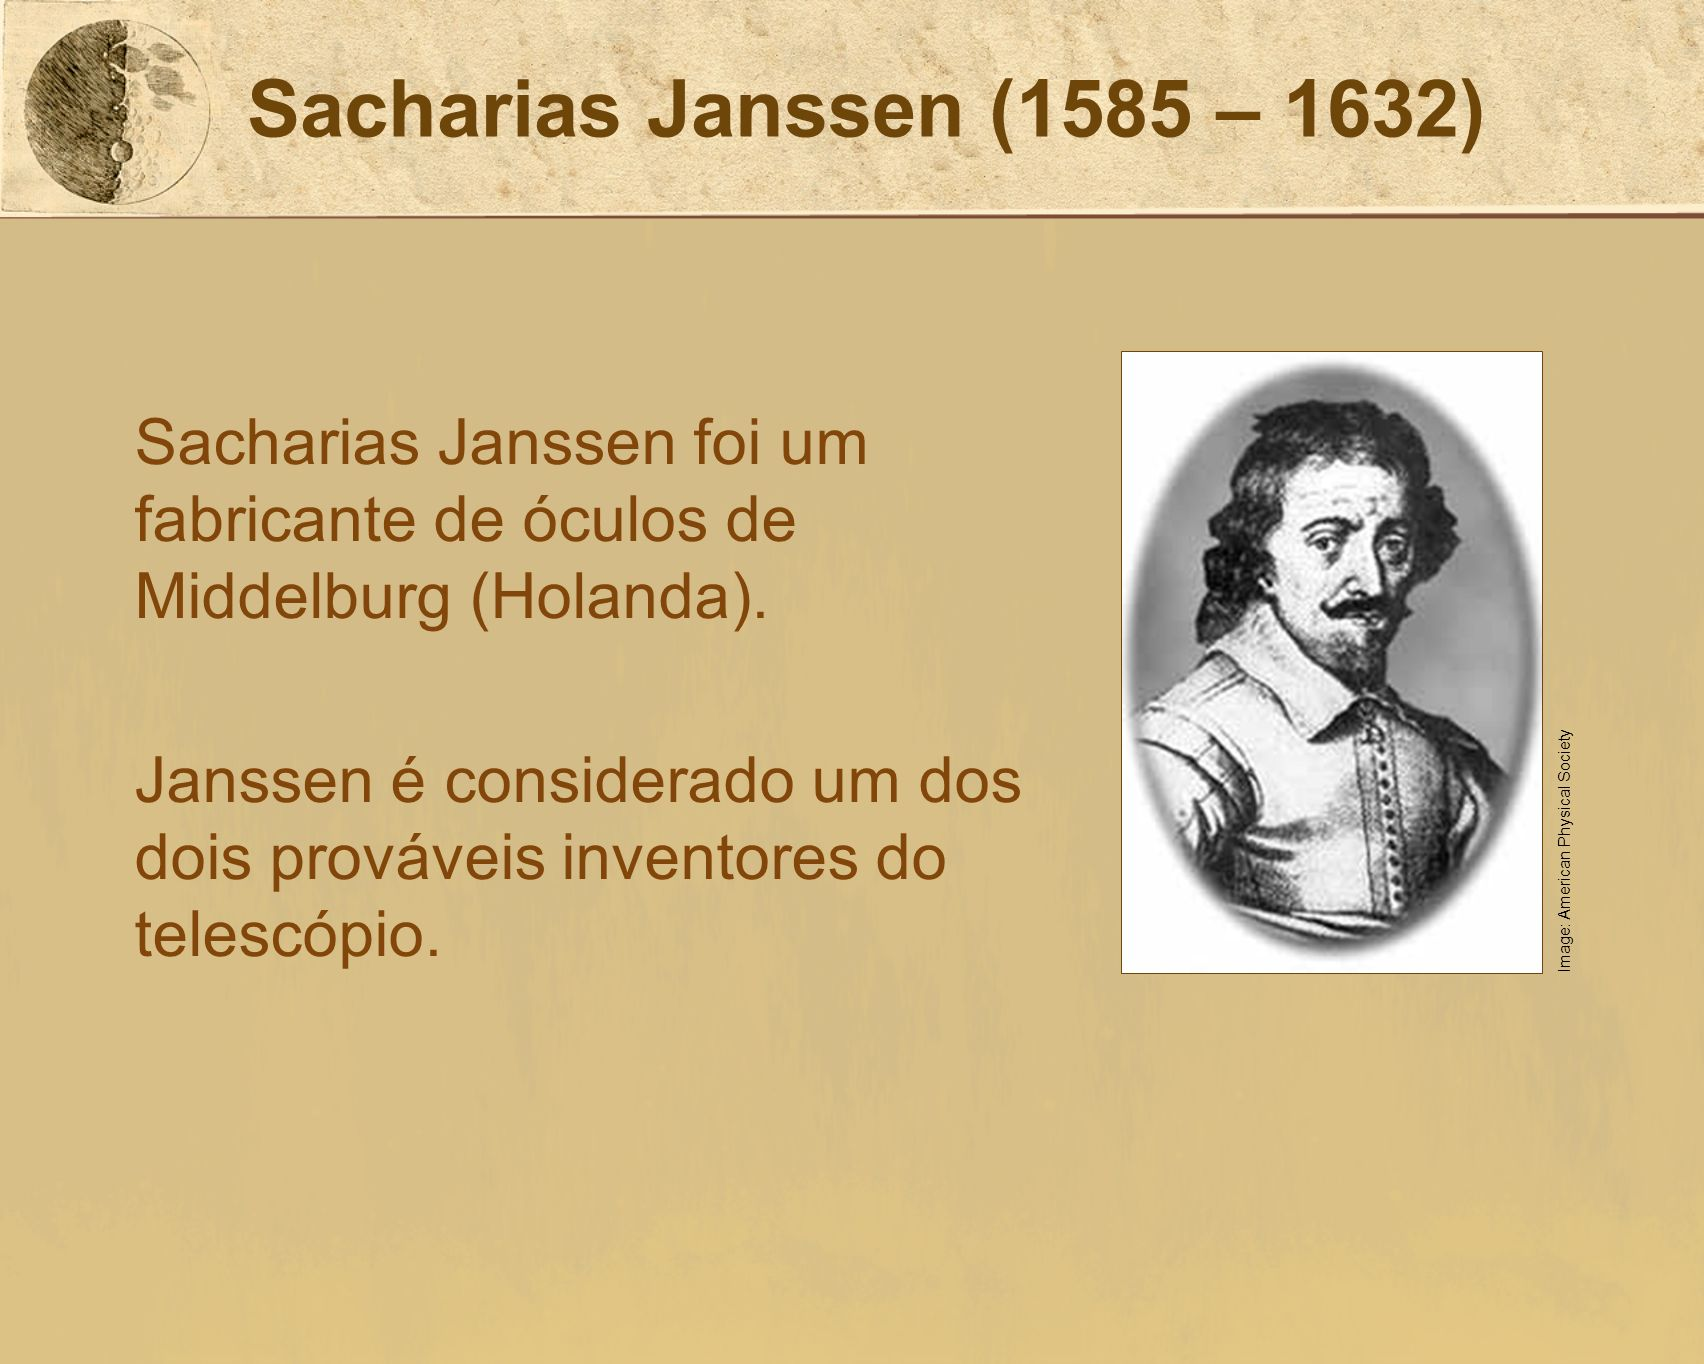 Sacharias Janssen (1585 – 1632)Sacharias Janssen foi um fabricante de óculos de Middelburg (Holanda).